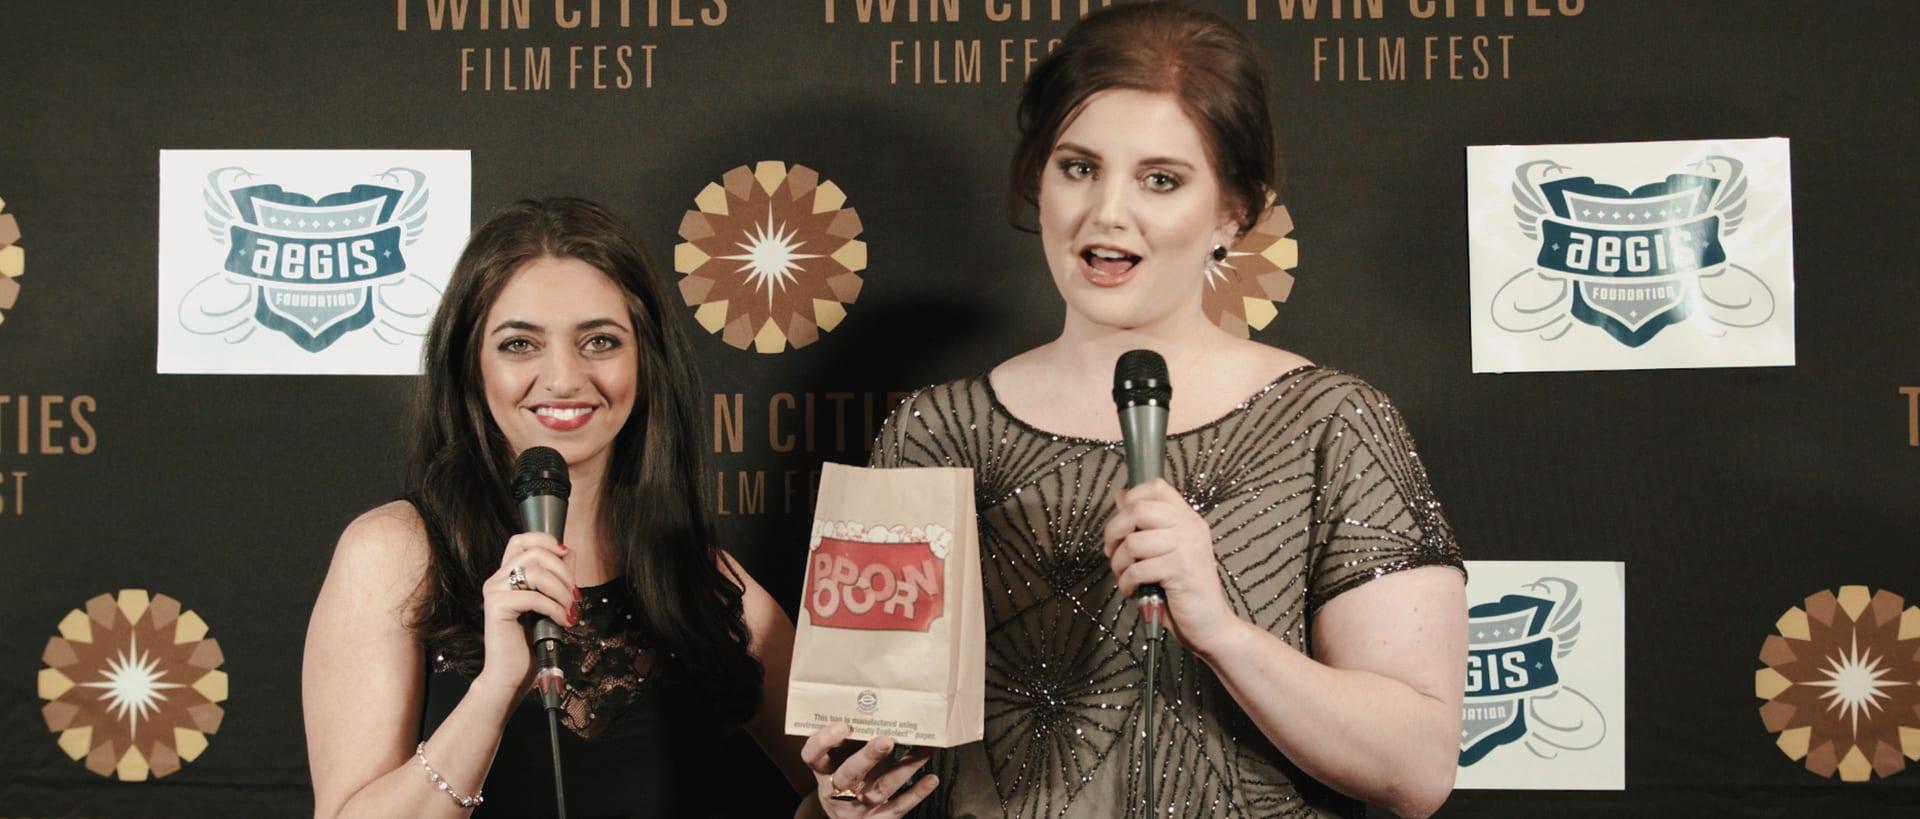 Hita & Hill at Minnesota's 24th Annual Oscar Experience